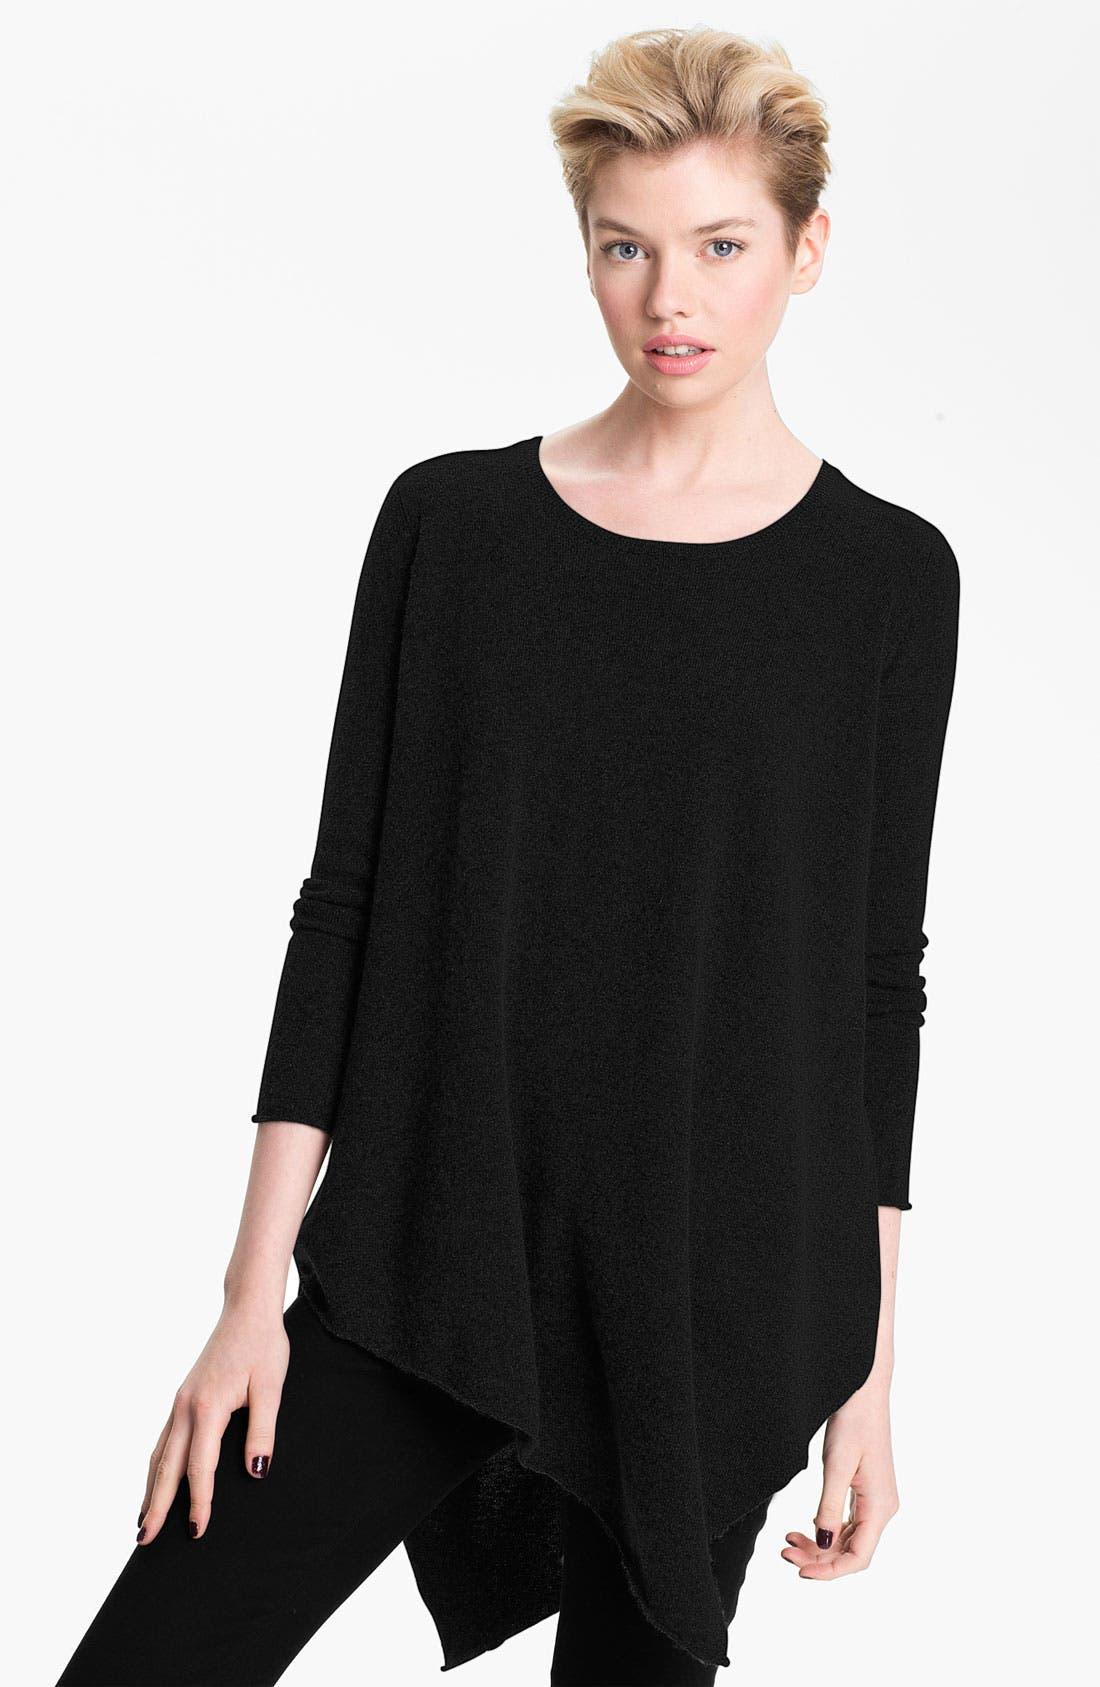 JOIE 'Tambrel' Asymmetrical Sweater Tunic, Main, color, 002